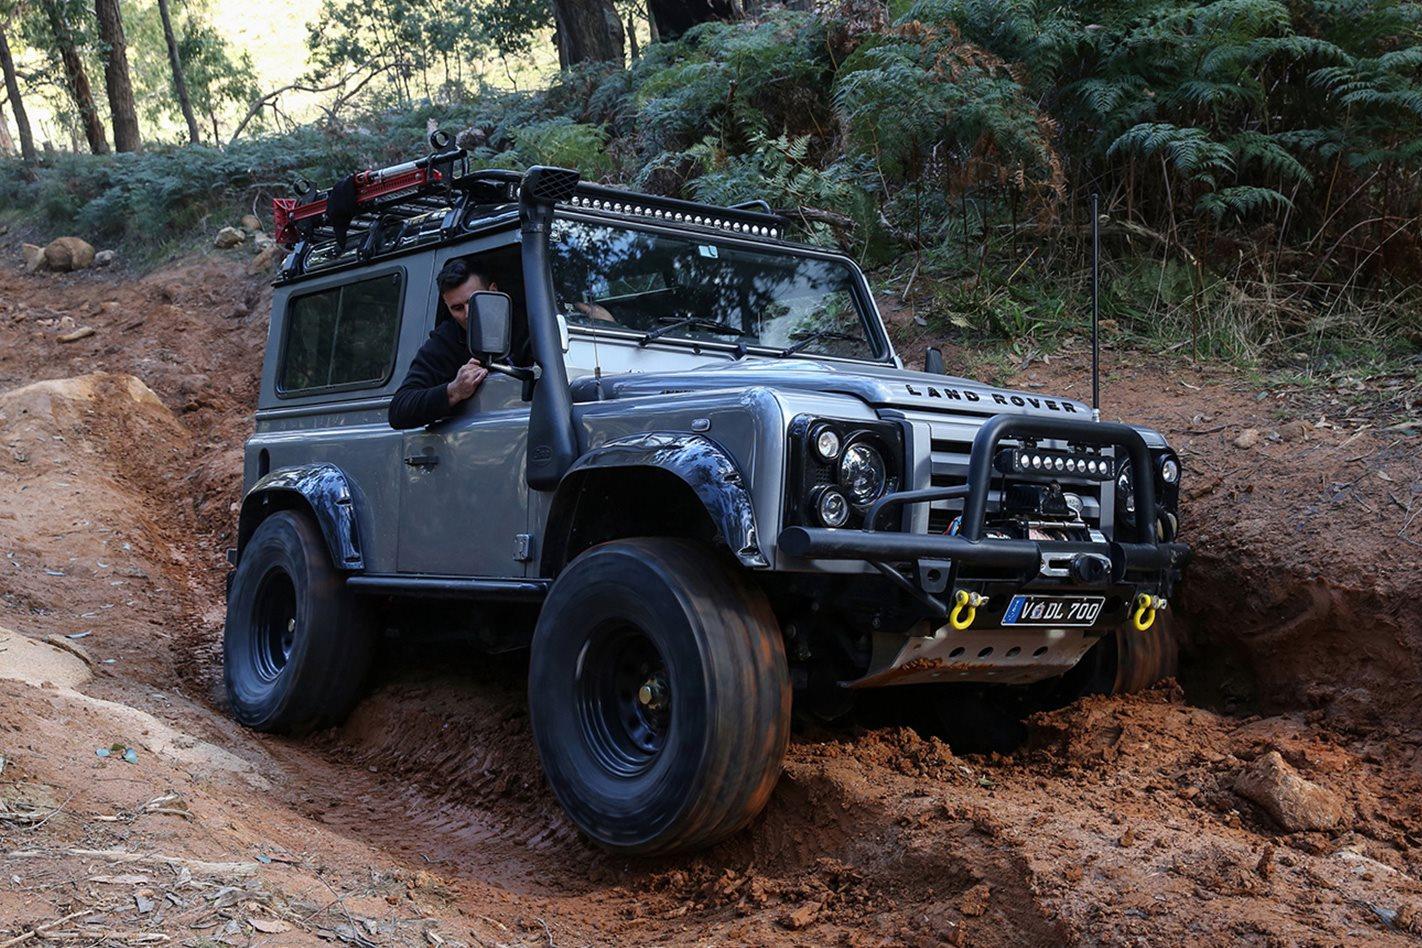 2013-Land-Rover-Defender-90-Limtied-Edition-front.jpg